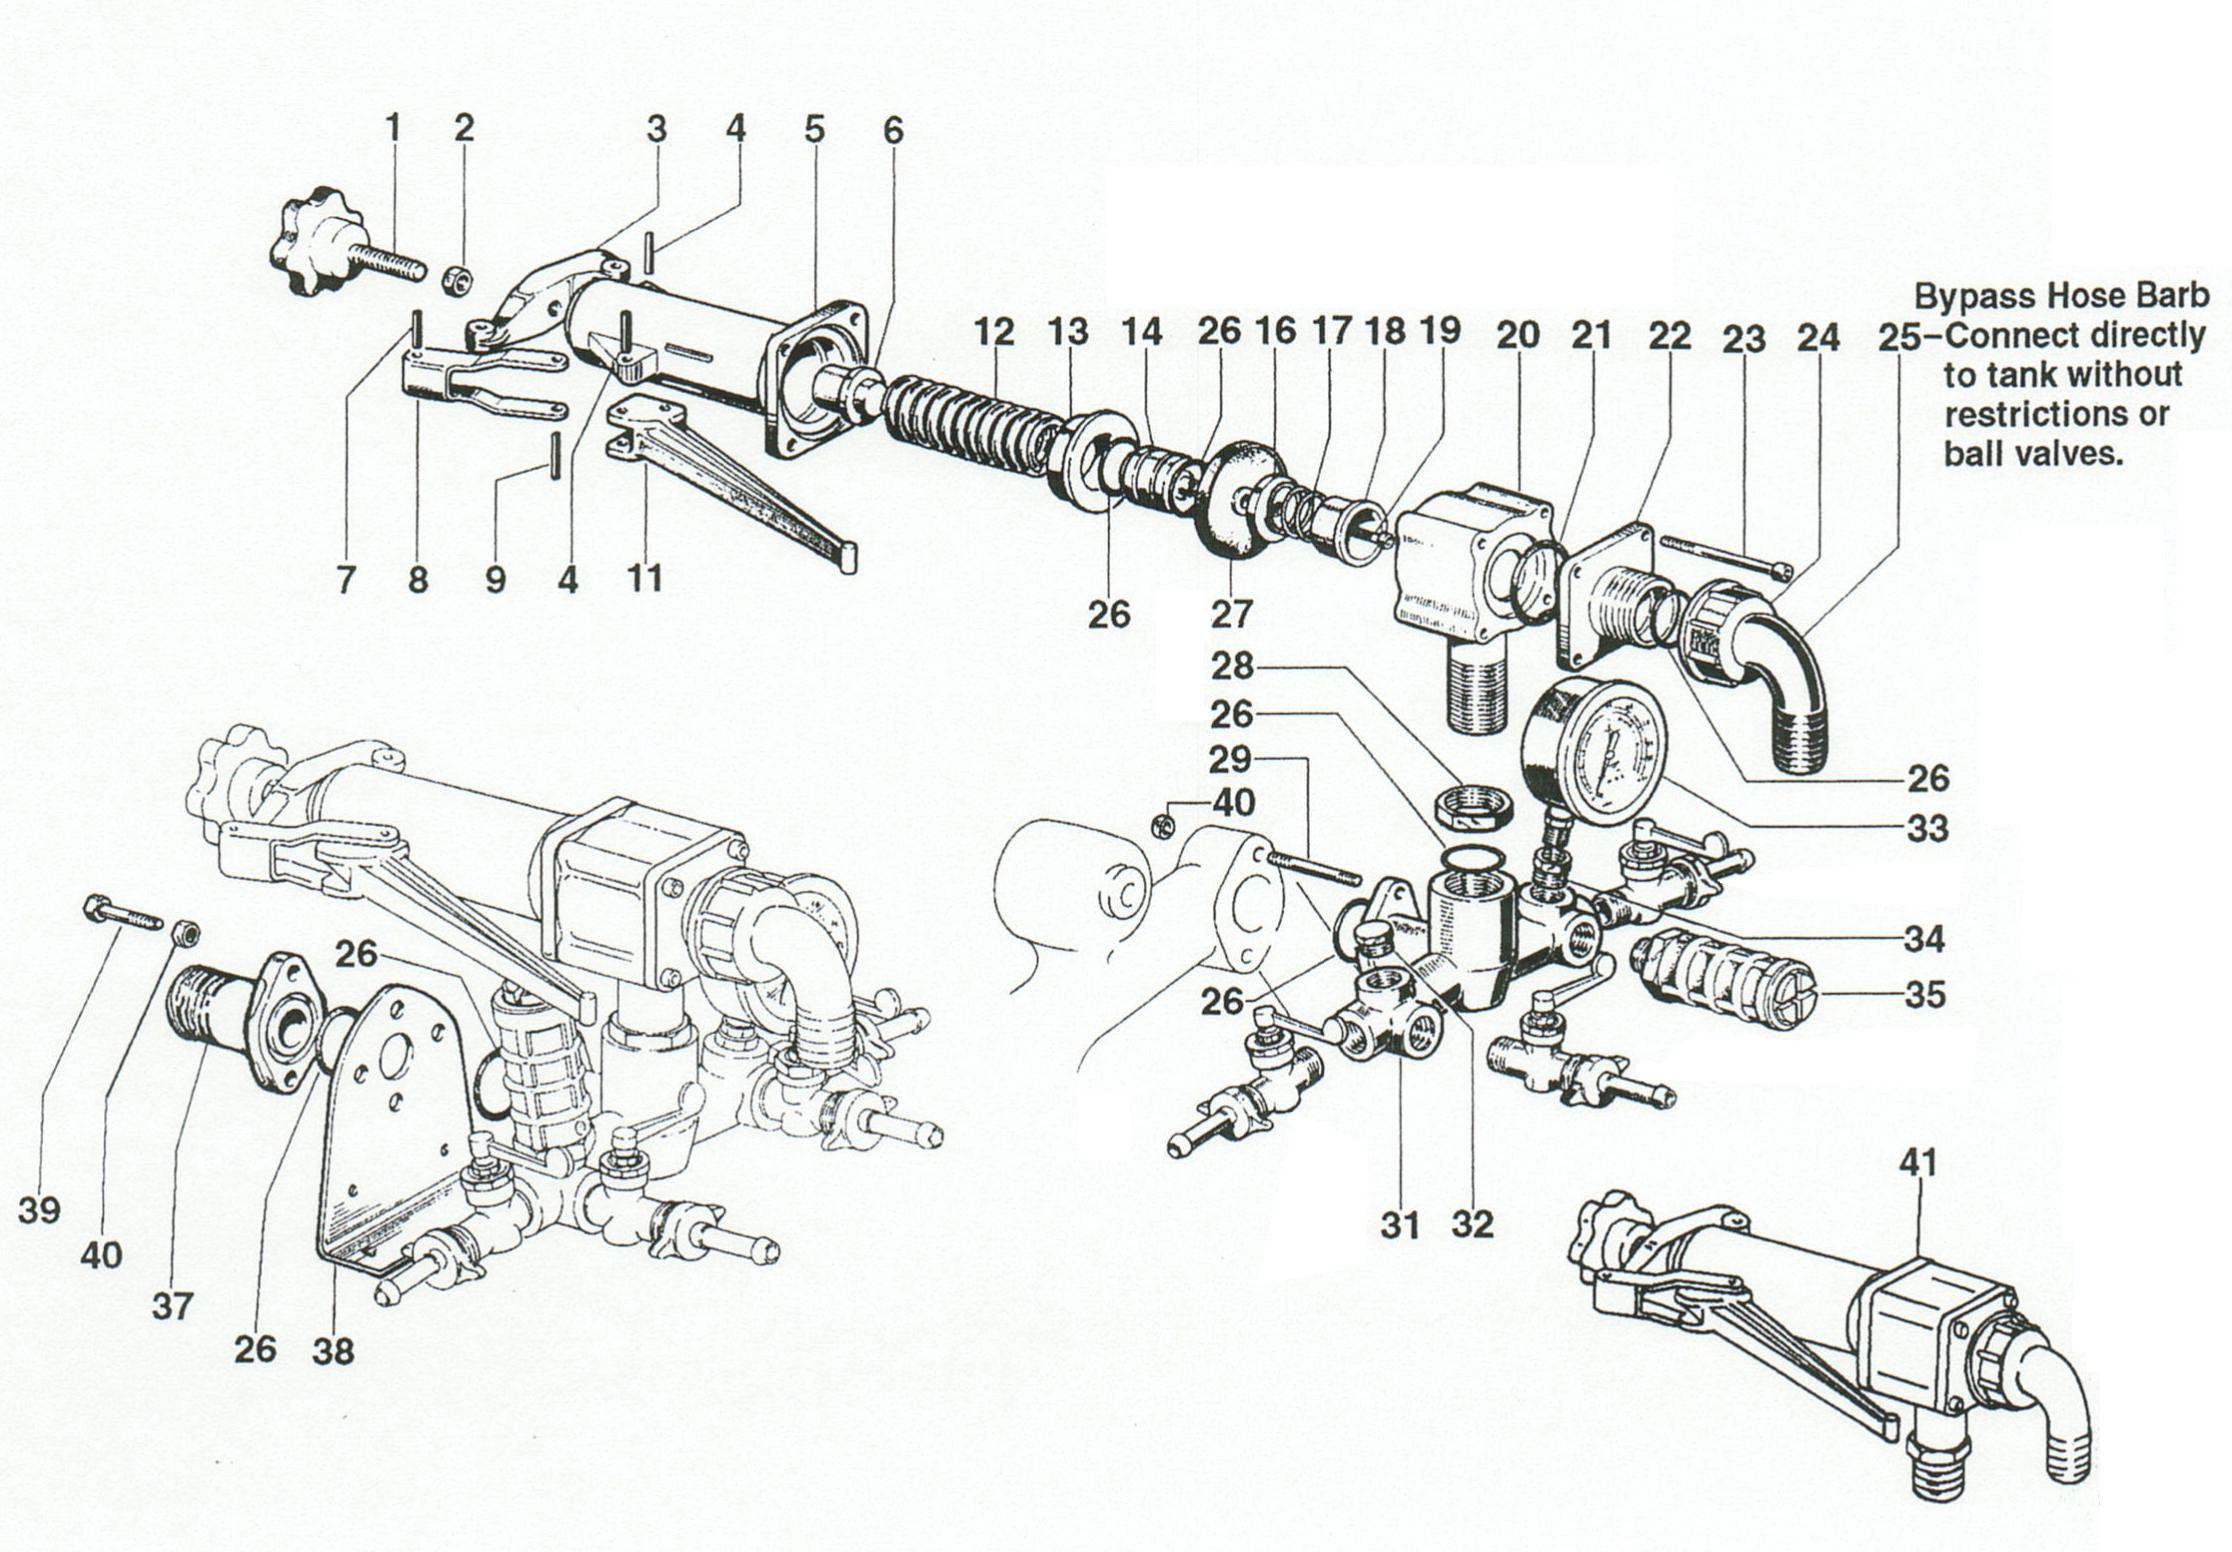 Hypro gs50gi control unit sprayer depot parts list pooptronica